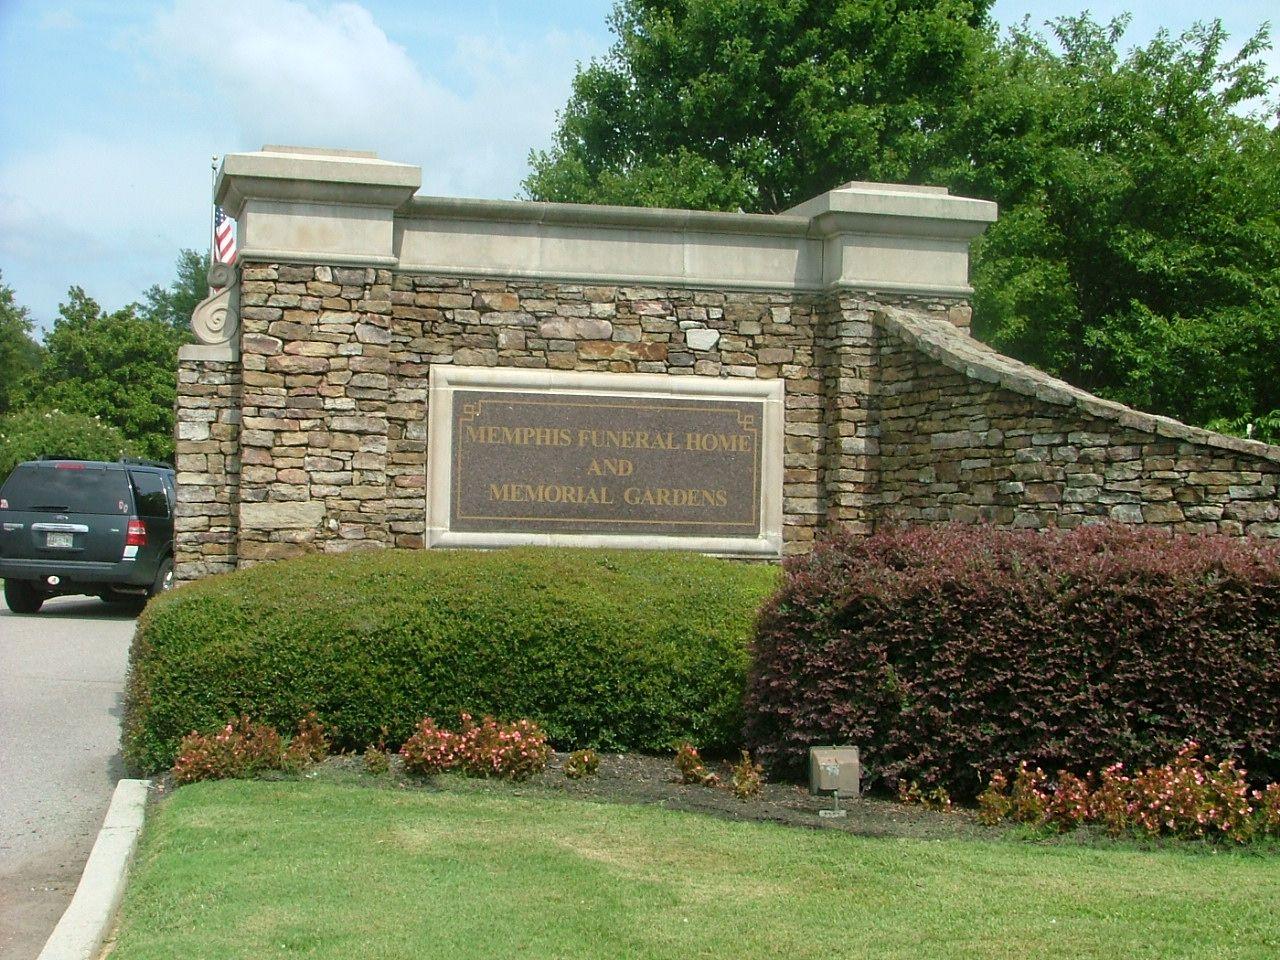 d8290e29961b3a5d0bd18f19c191355f - Memphis Memory Gardens Find A Grave